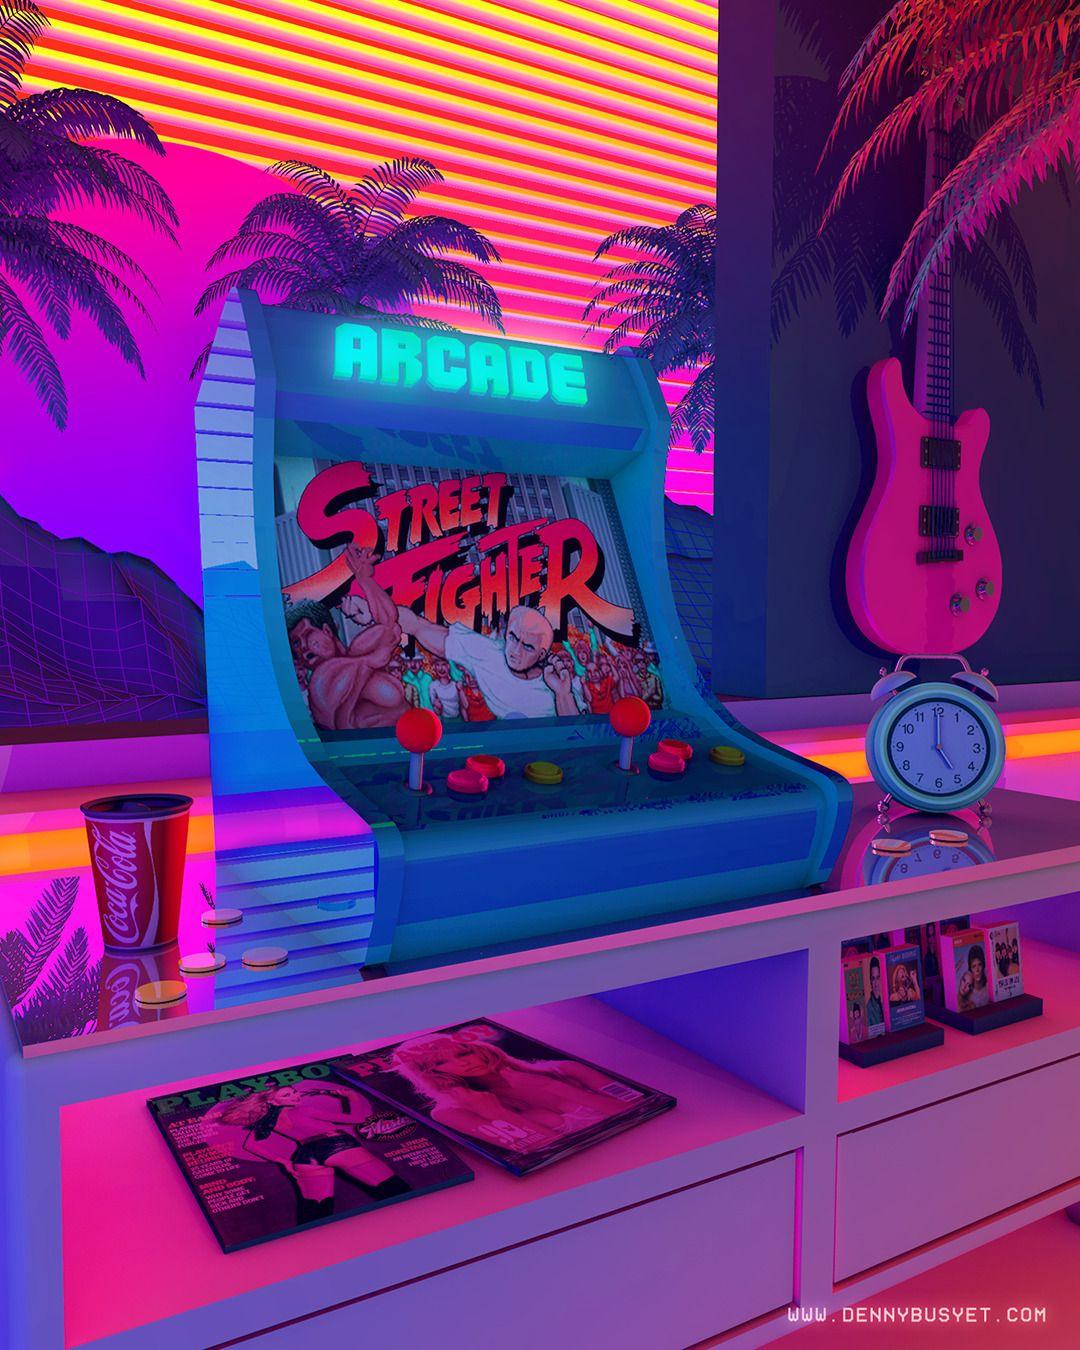 My Fave Game In My Childhood A R C A D E D R E A M S By Dennybusyet Arcade Retrowave Nostalgia Streetfight Cyberpunk Aesthetic Retro Waves Vaporwave